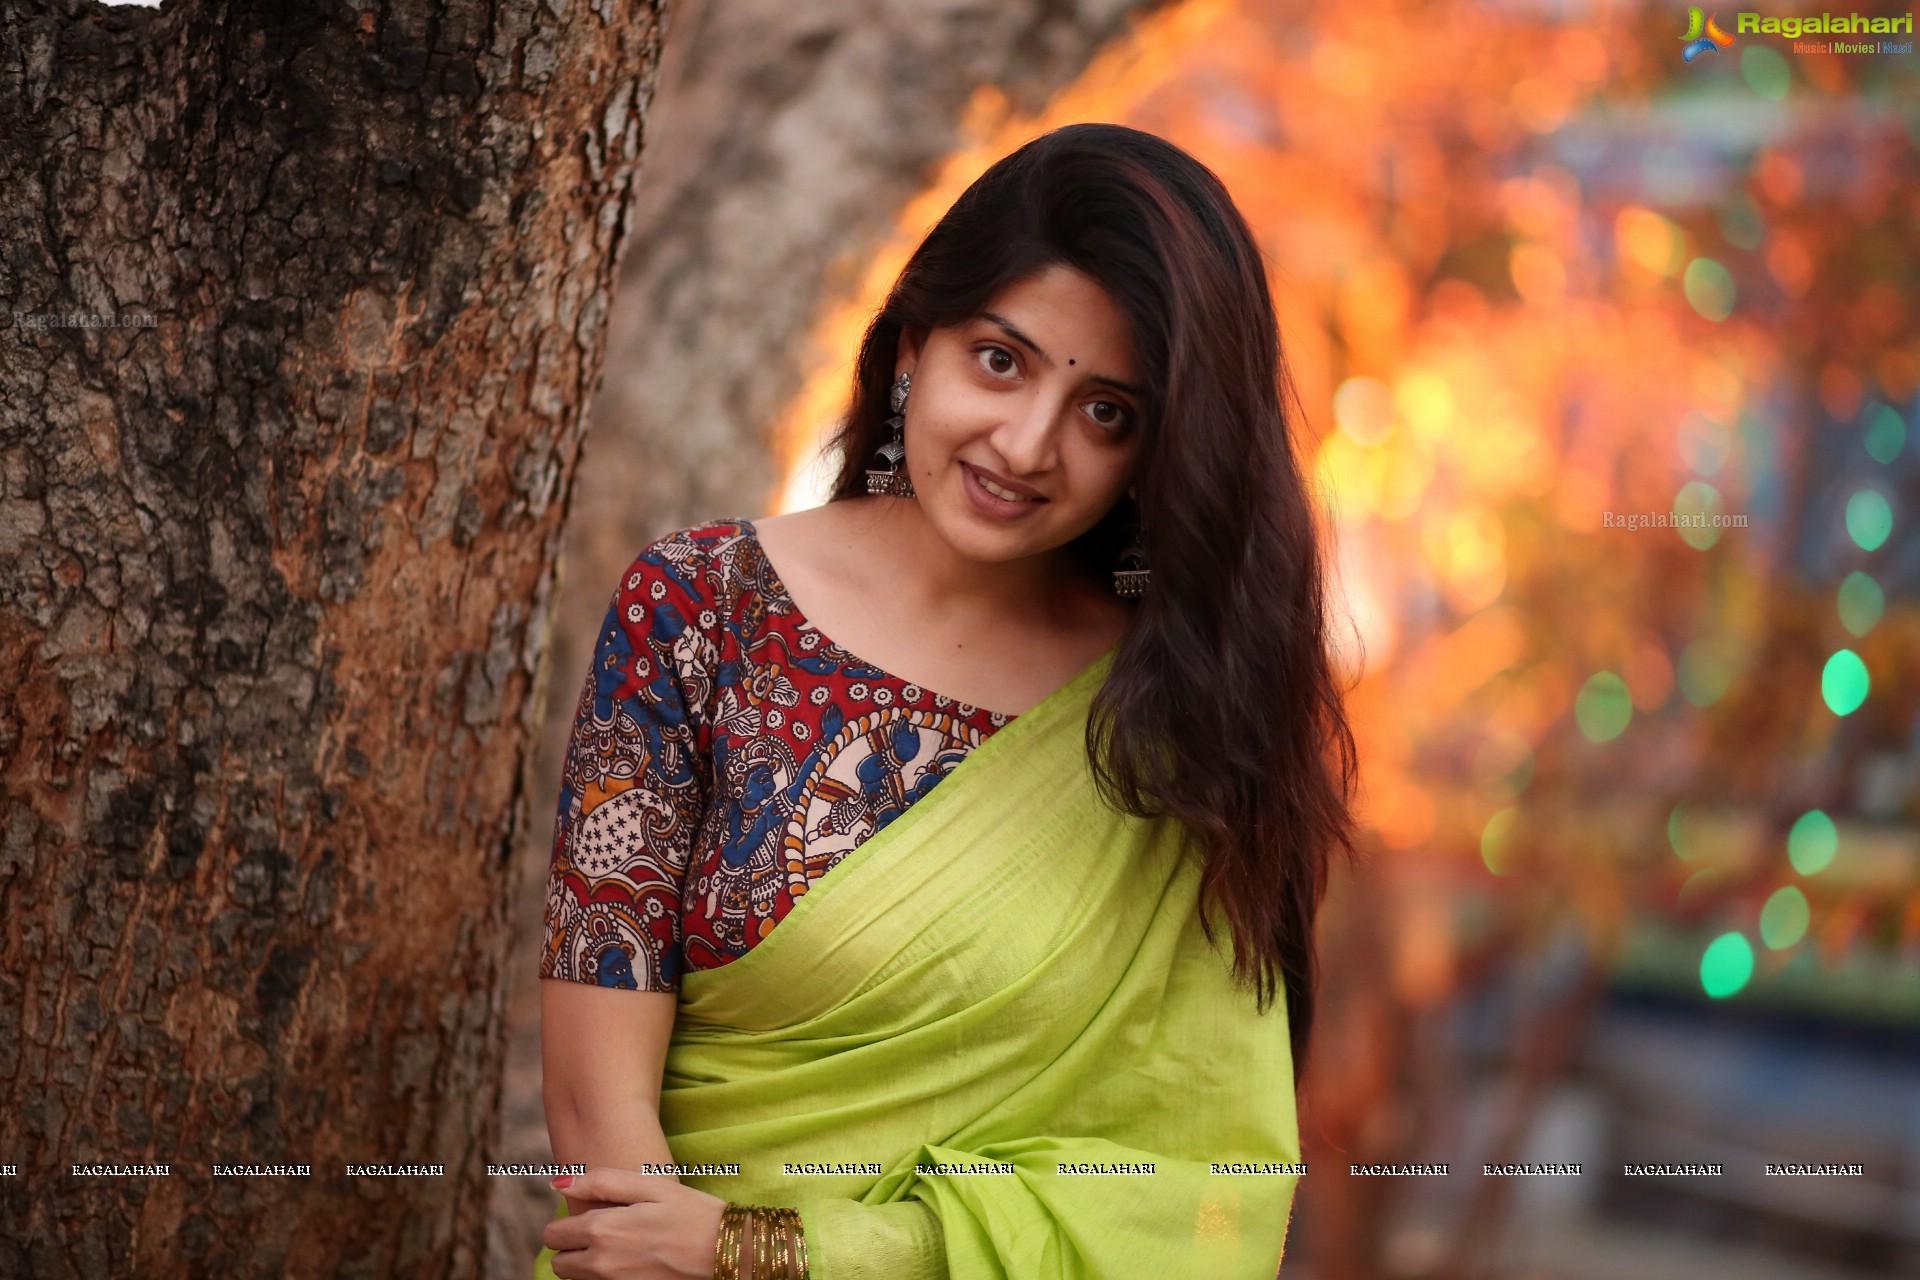 poonam kaur lal (high definition) image 12 | telugu movie actress